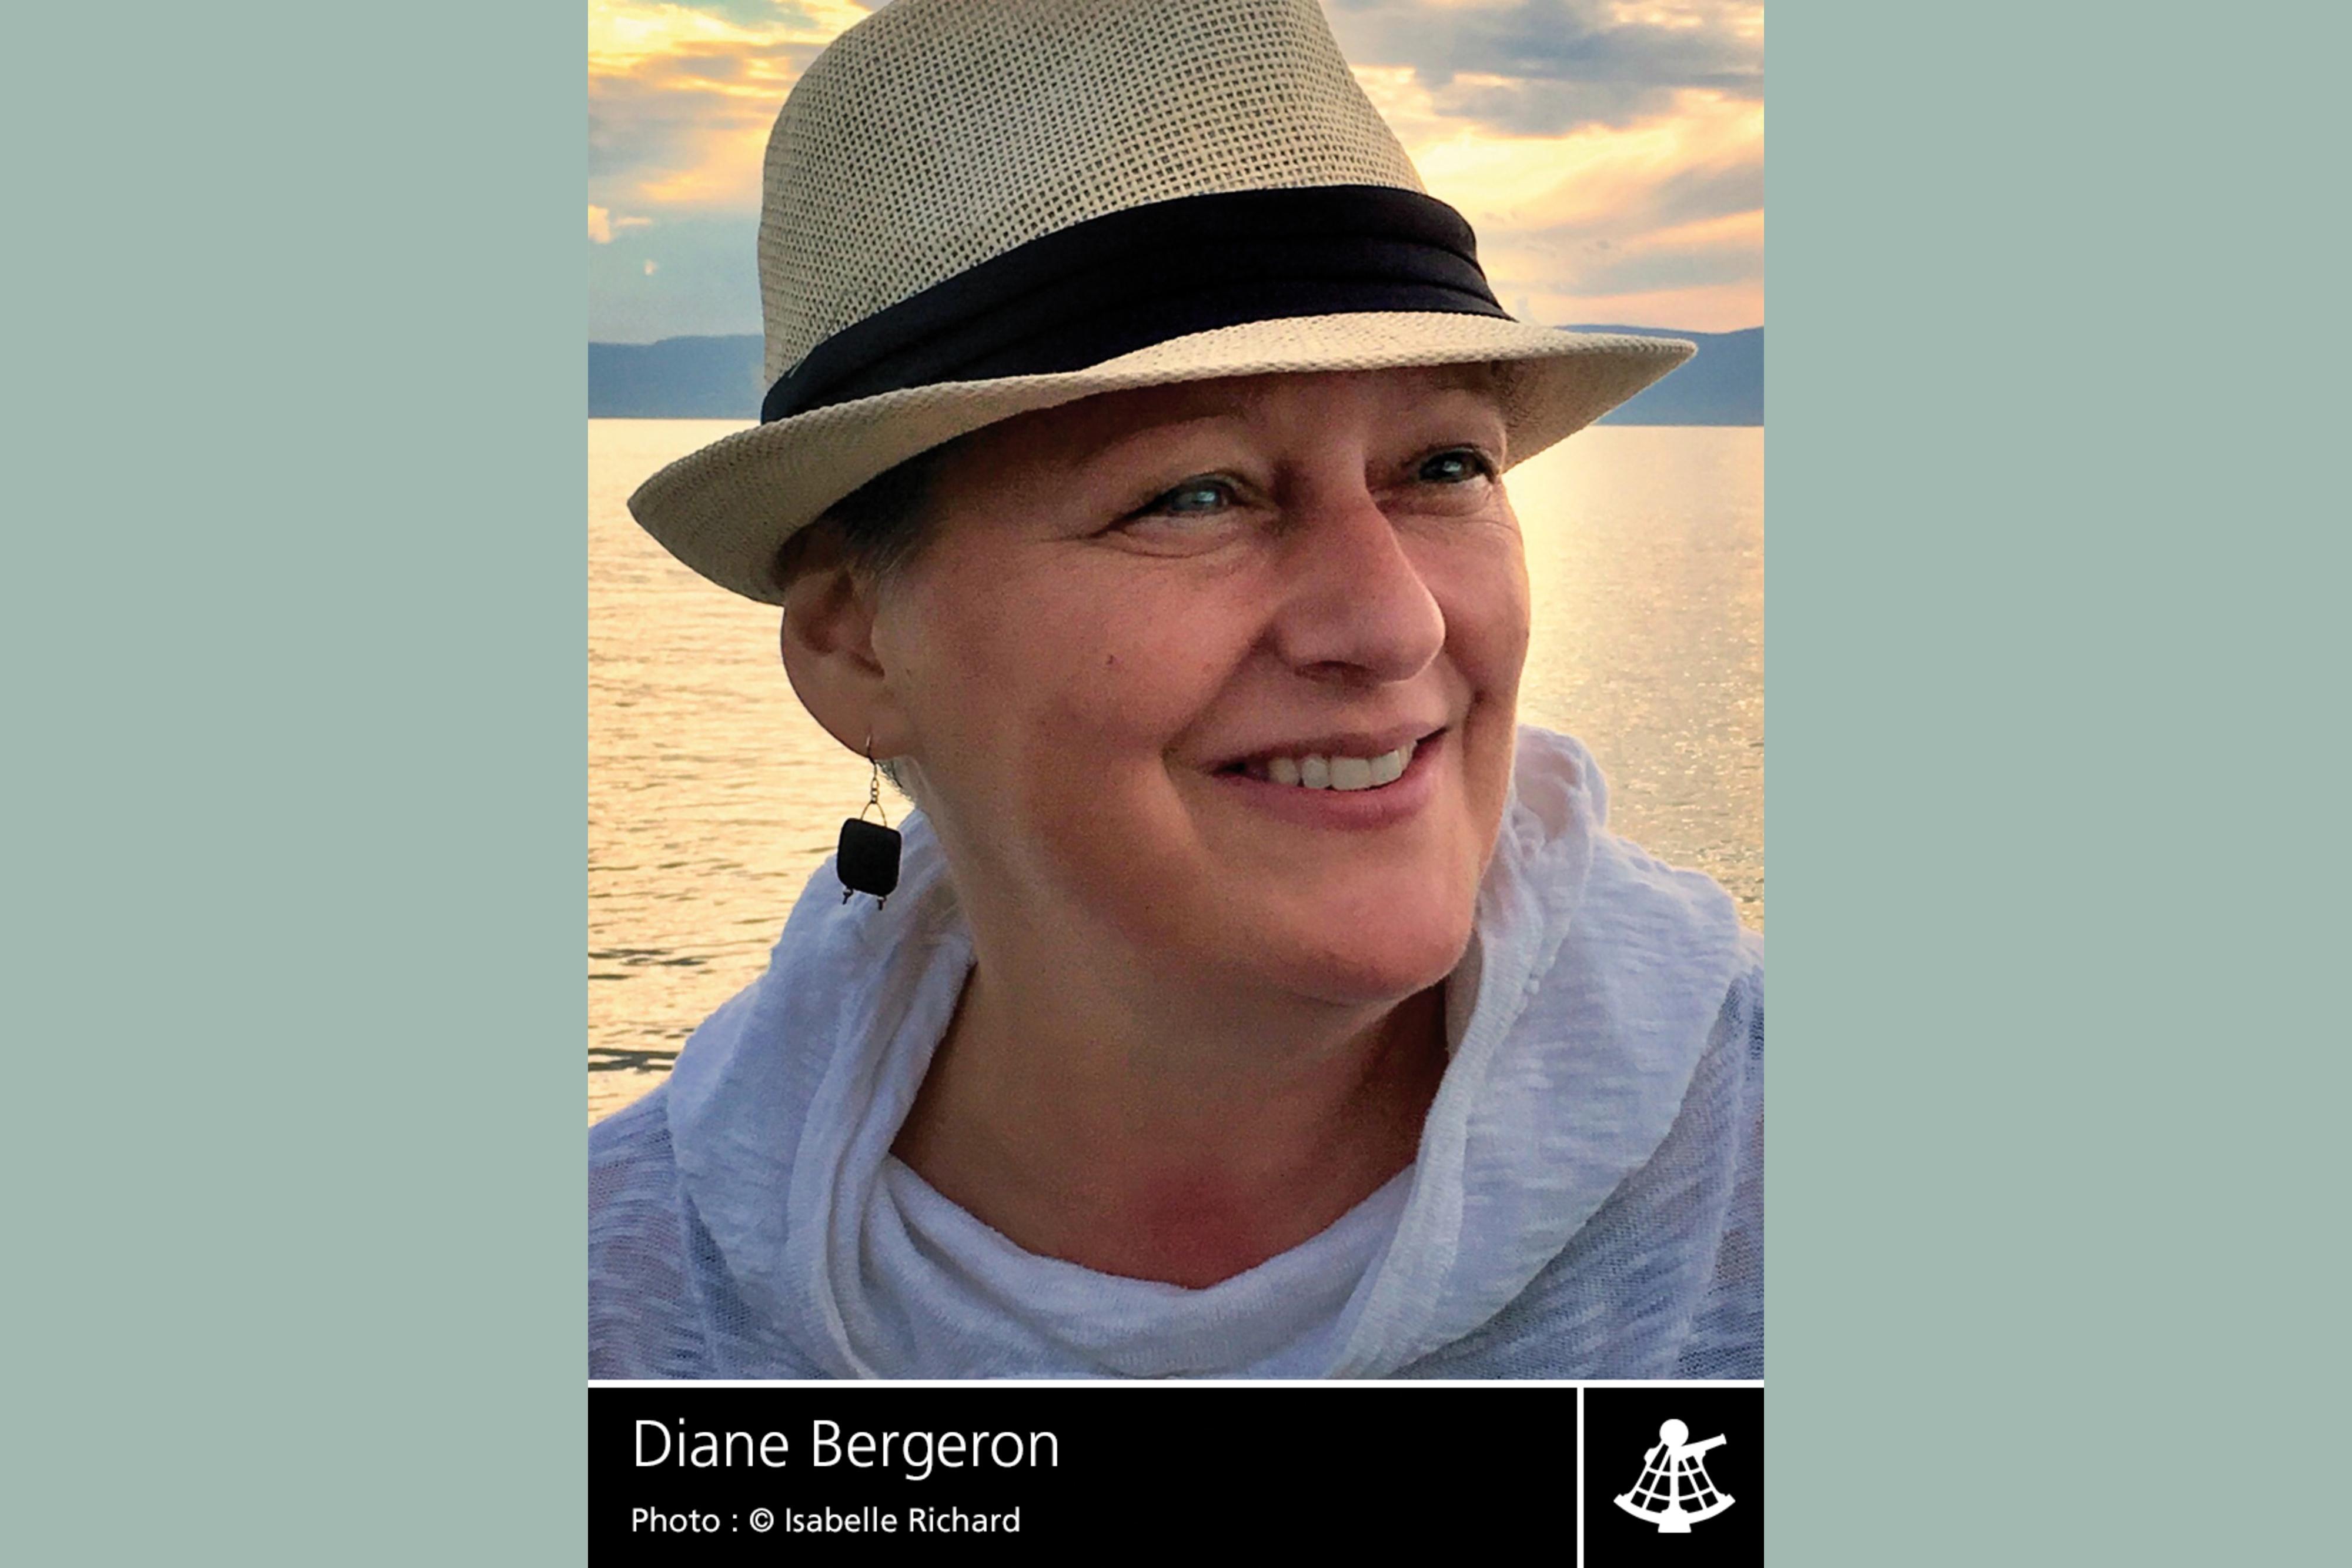 Diane_Bergeron_Terre_Nano_1